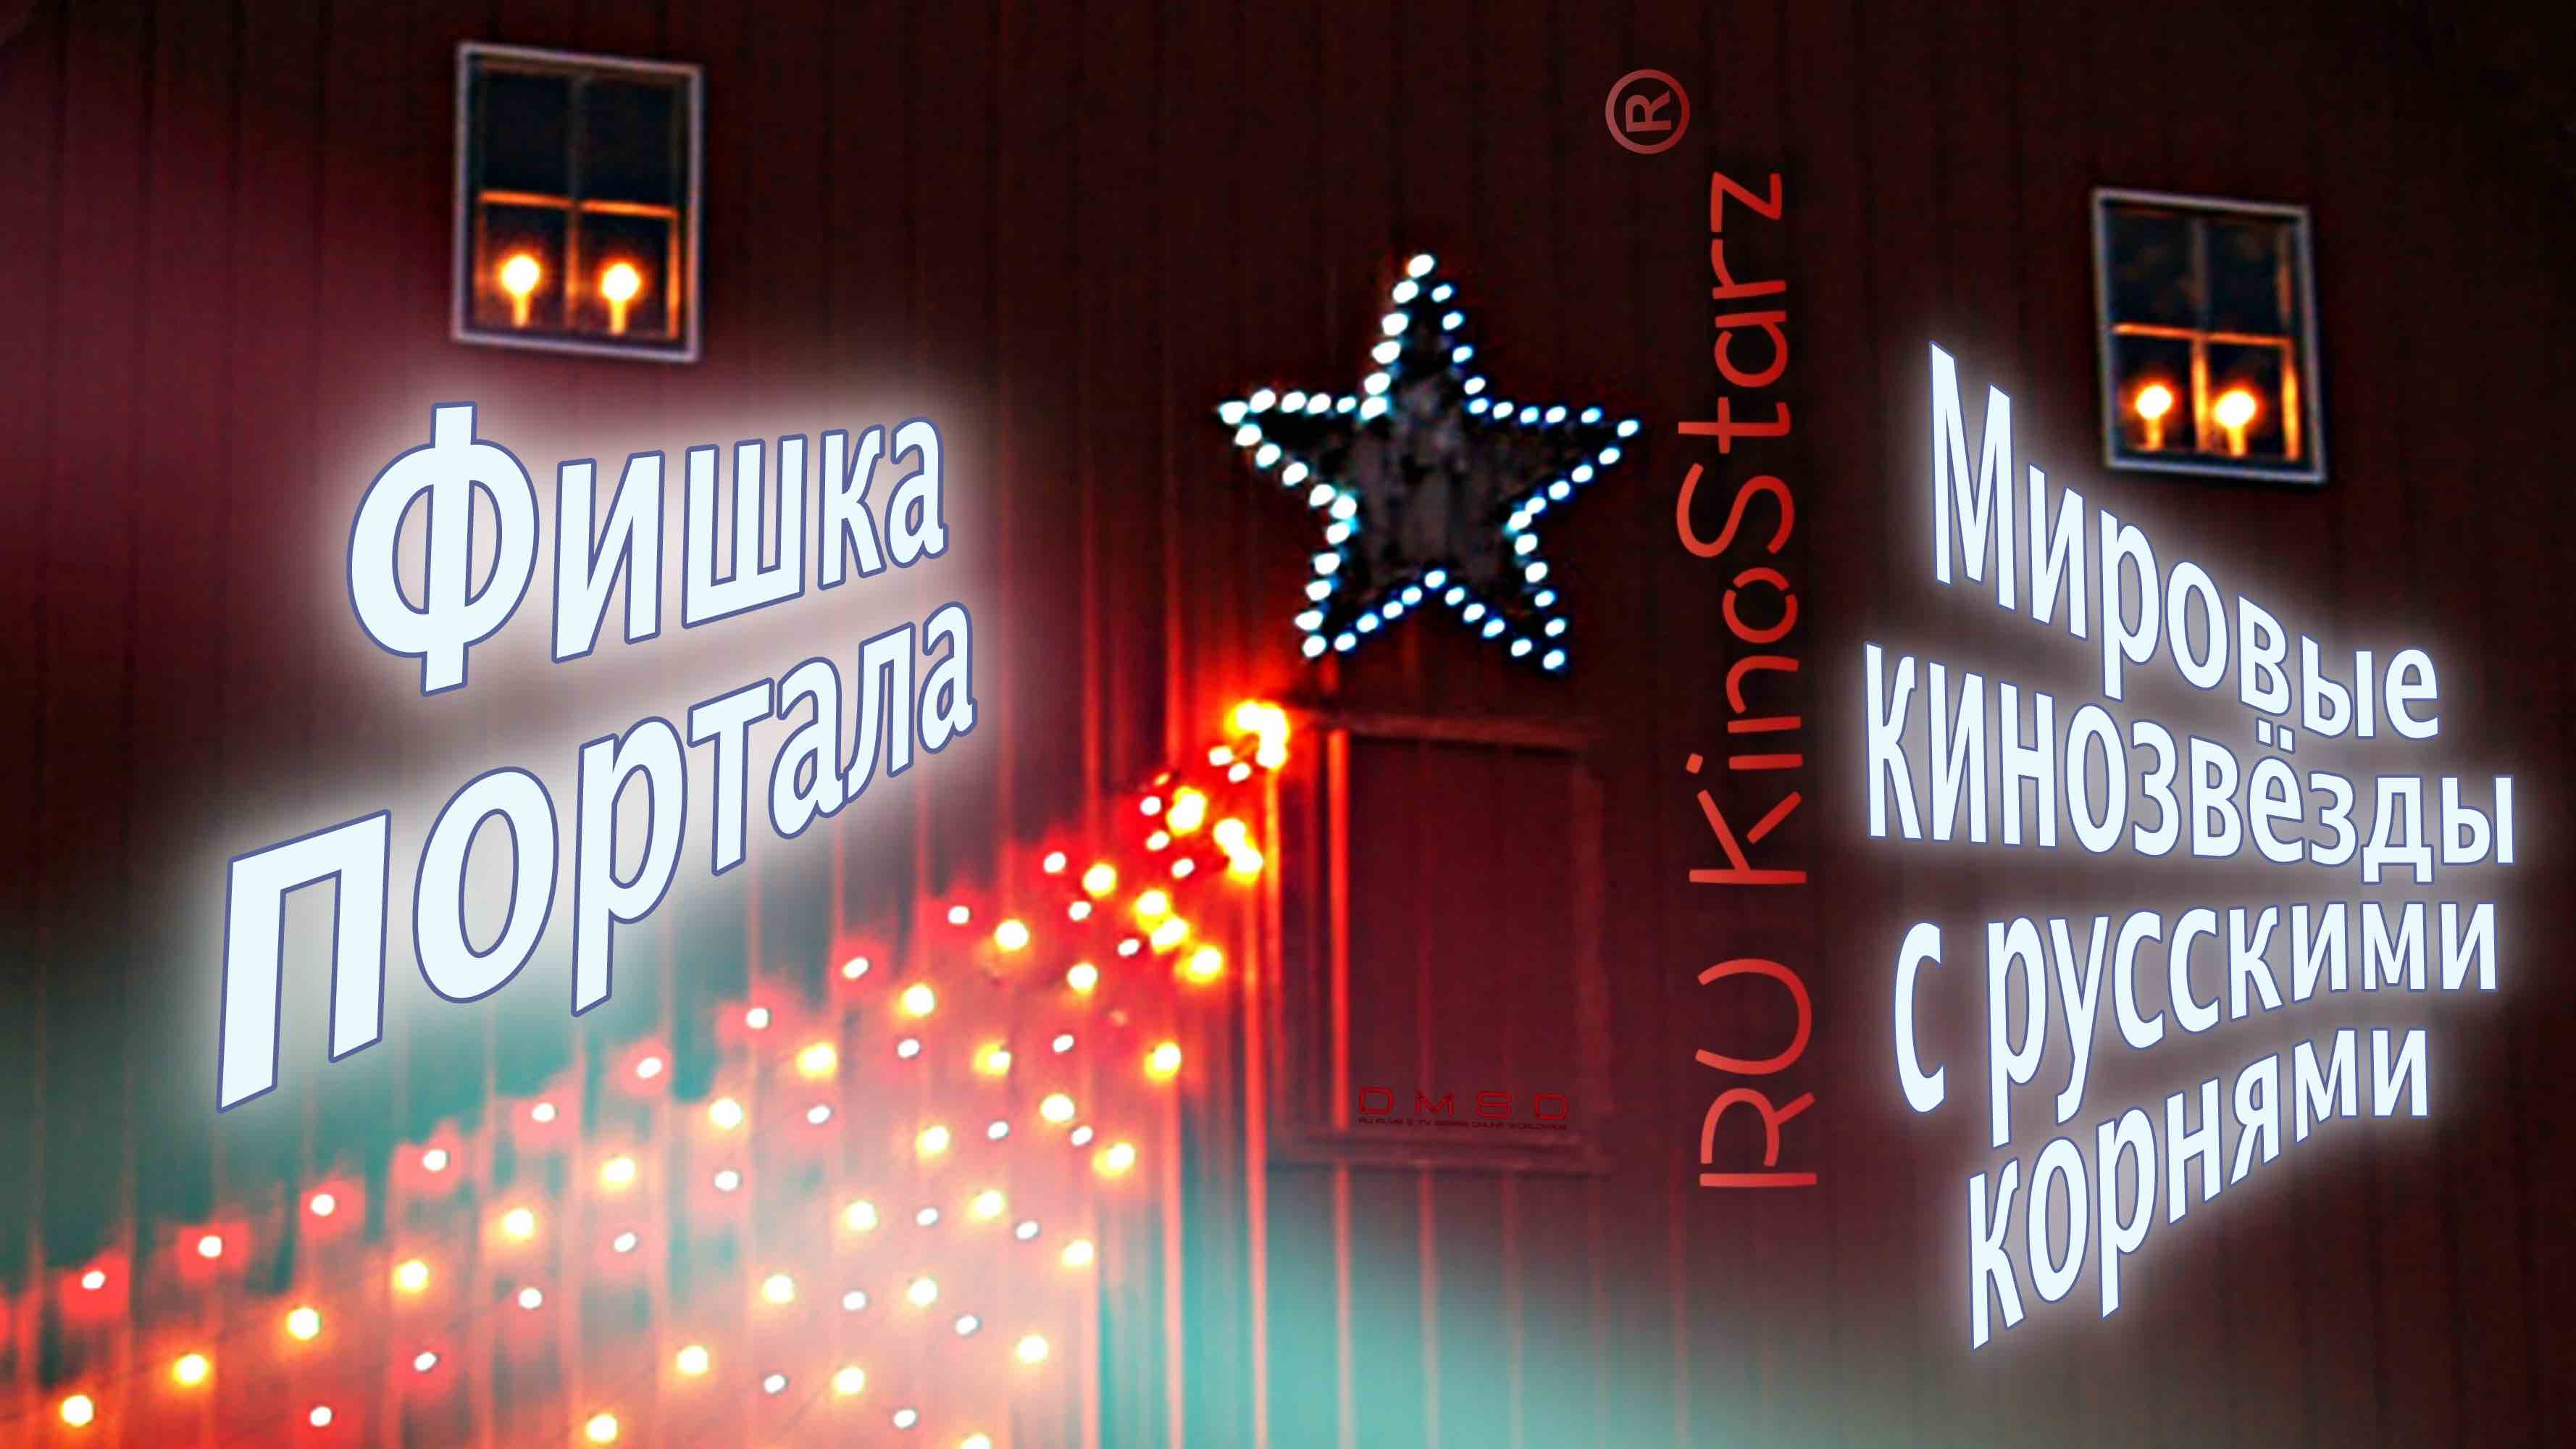 КиноБлог и Ру КиноСтарз на DMSD